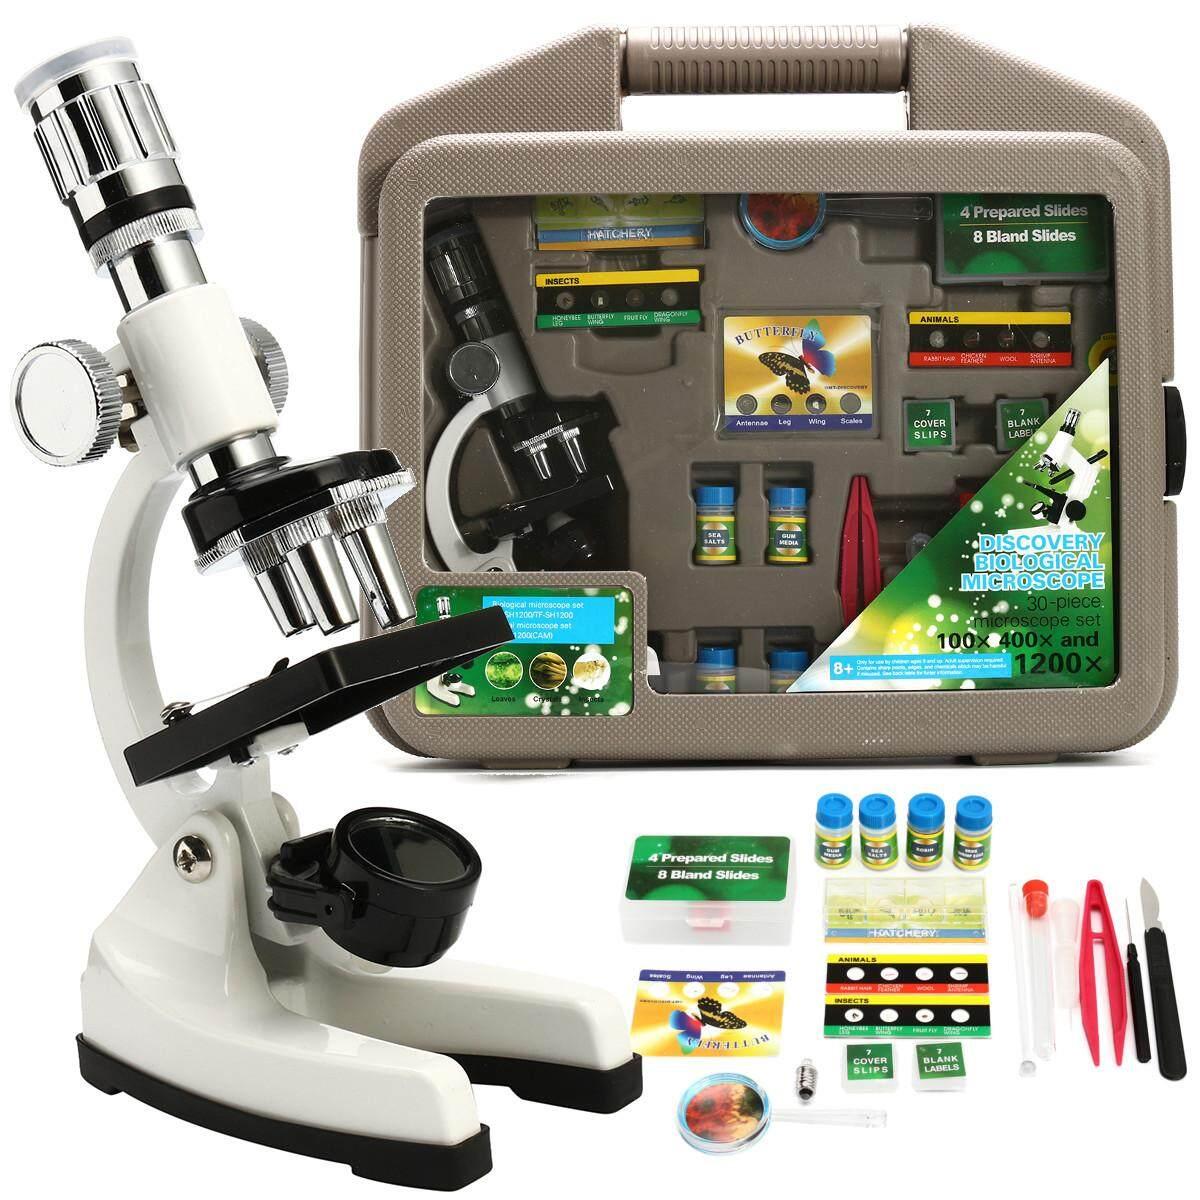 Zoom Microscope Kit Lab 400X-600X-1200X Magnification Beginner For Kids Students - Intl Đang Khuyến Mại Khủng